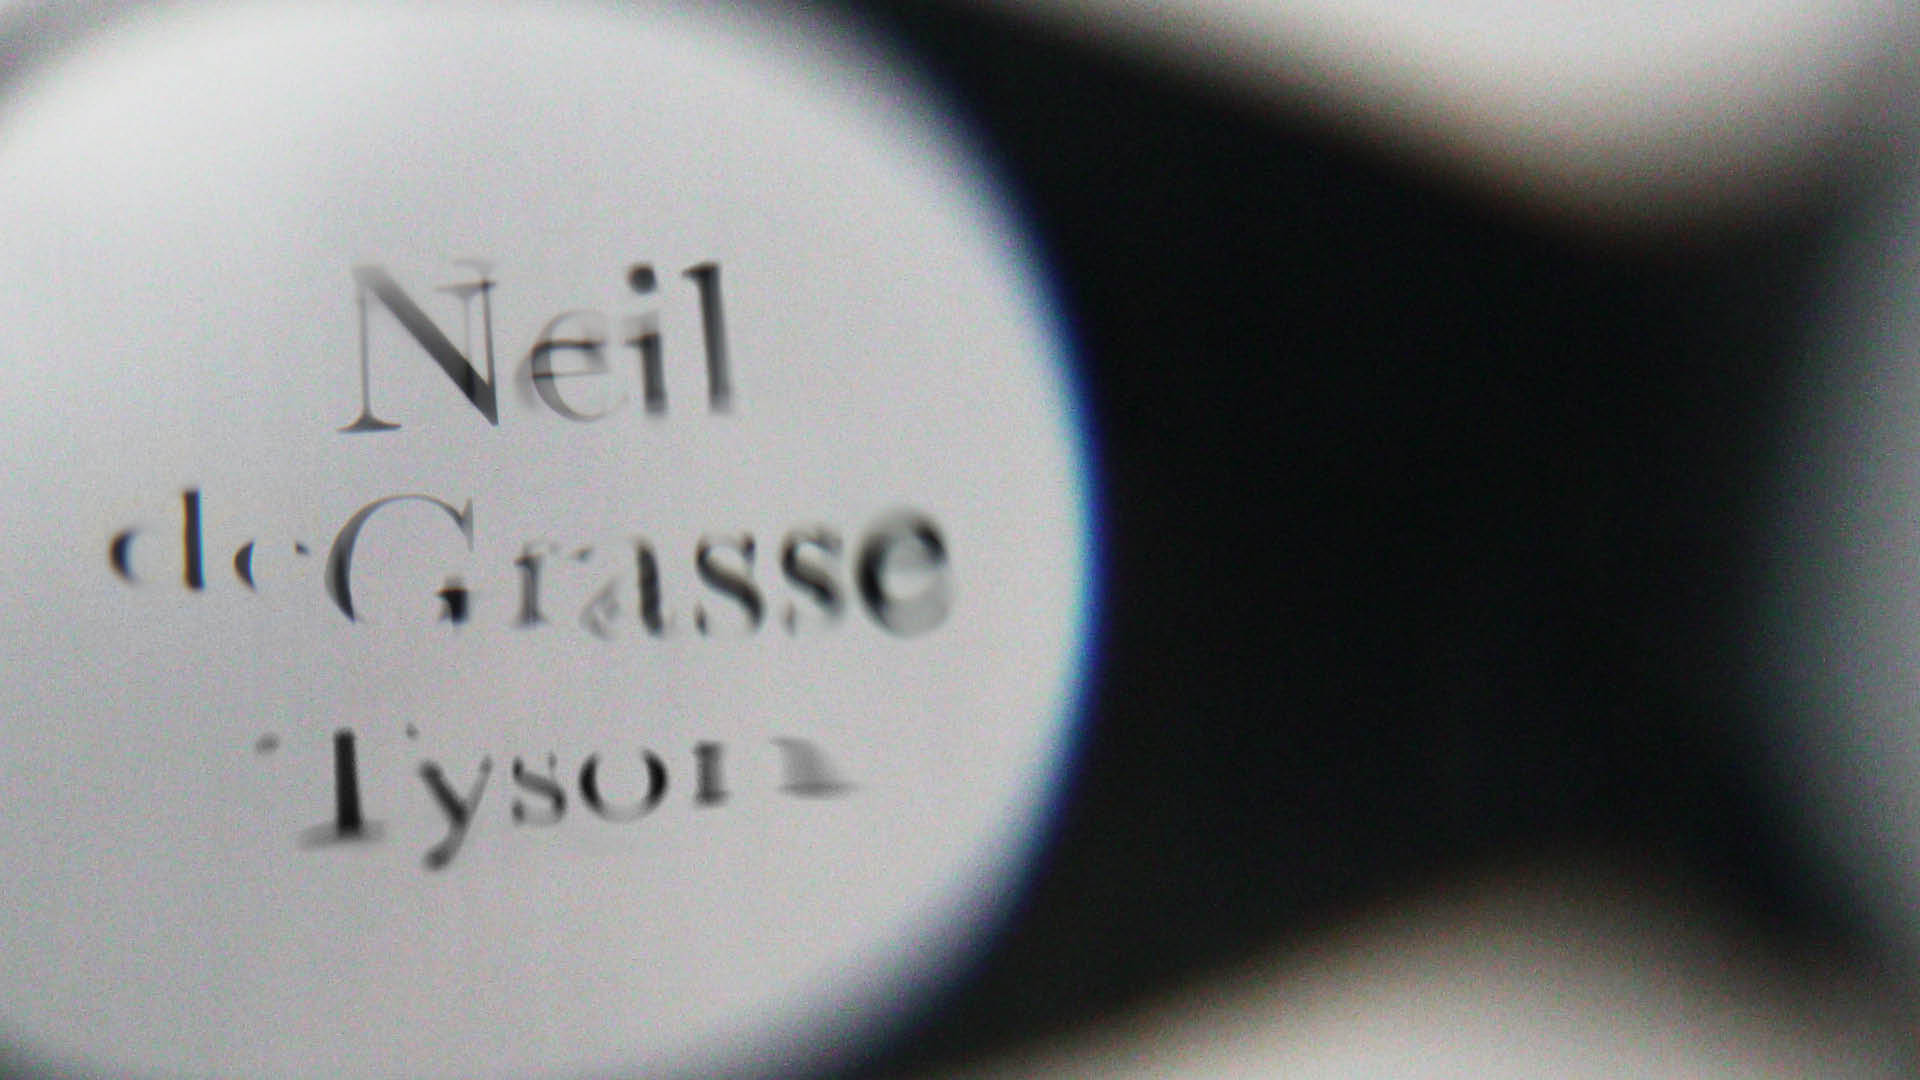 titles08_Neil.jpg